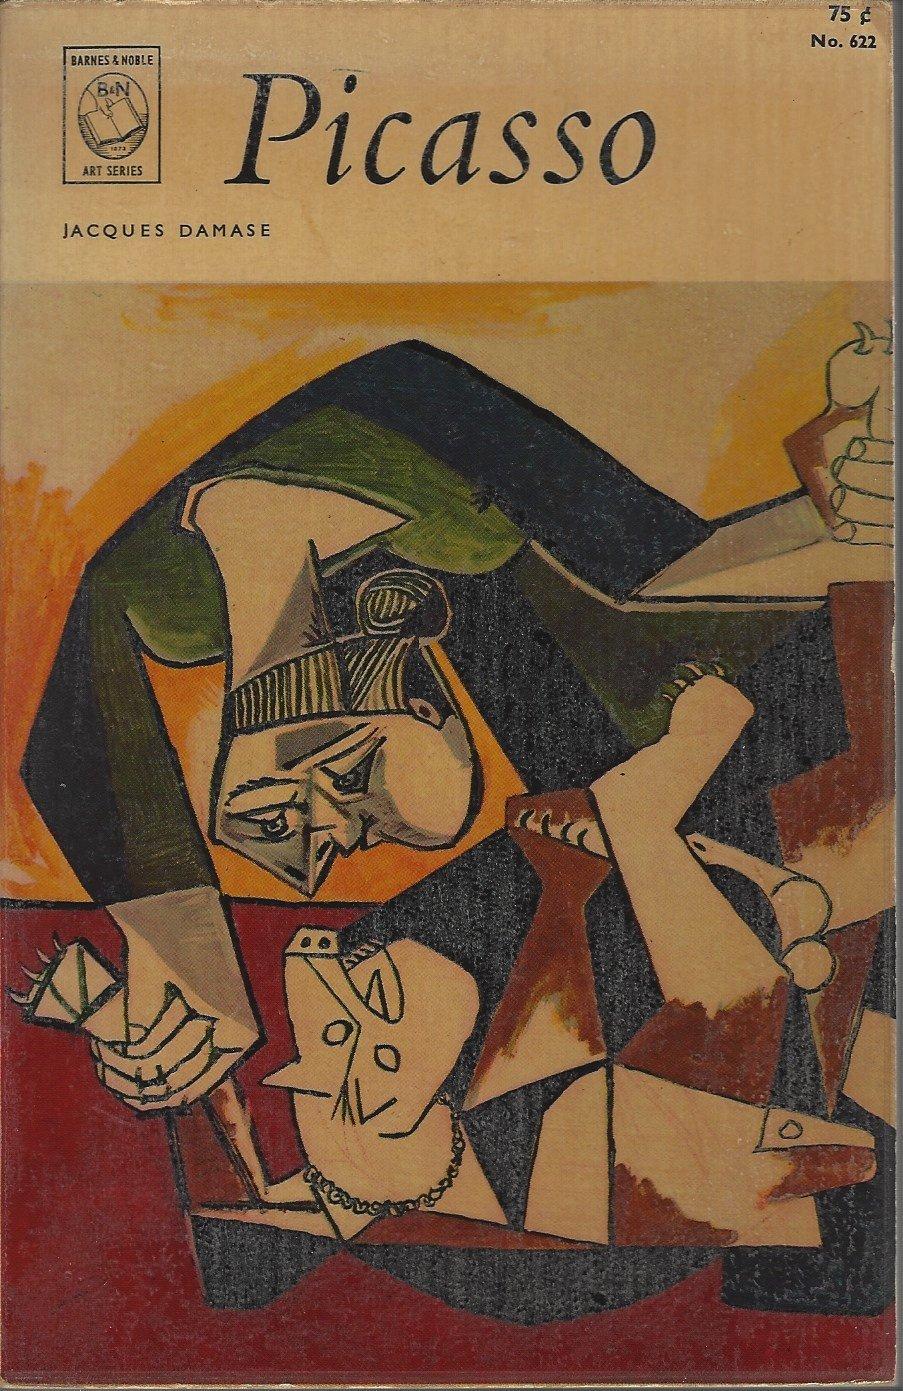 pablo picasso barnes noble art series no 622